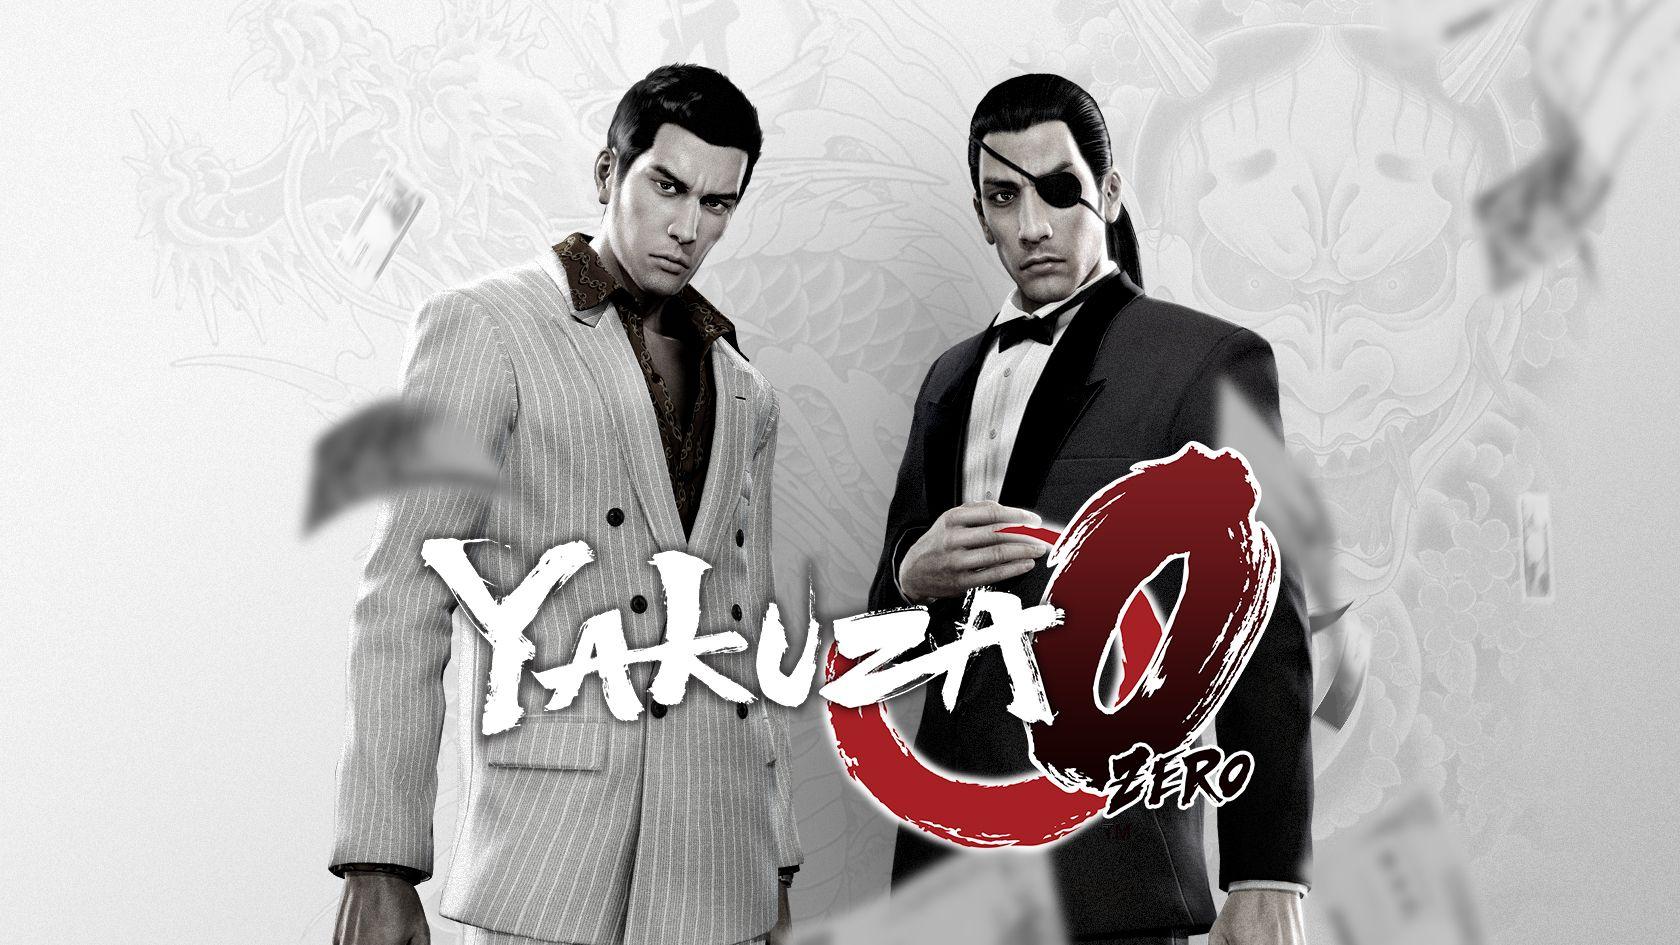 BlurryPhoenix Reflects: Yakuza 0